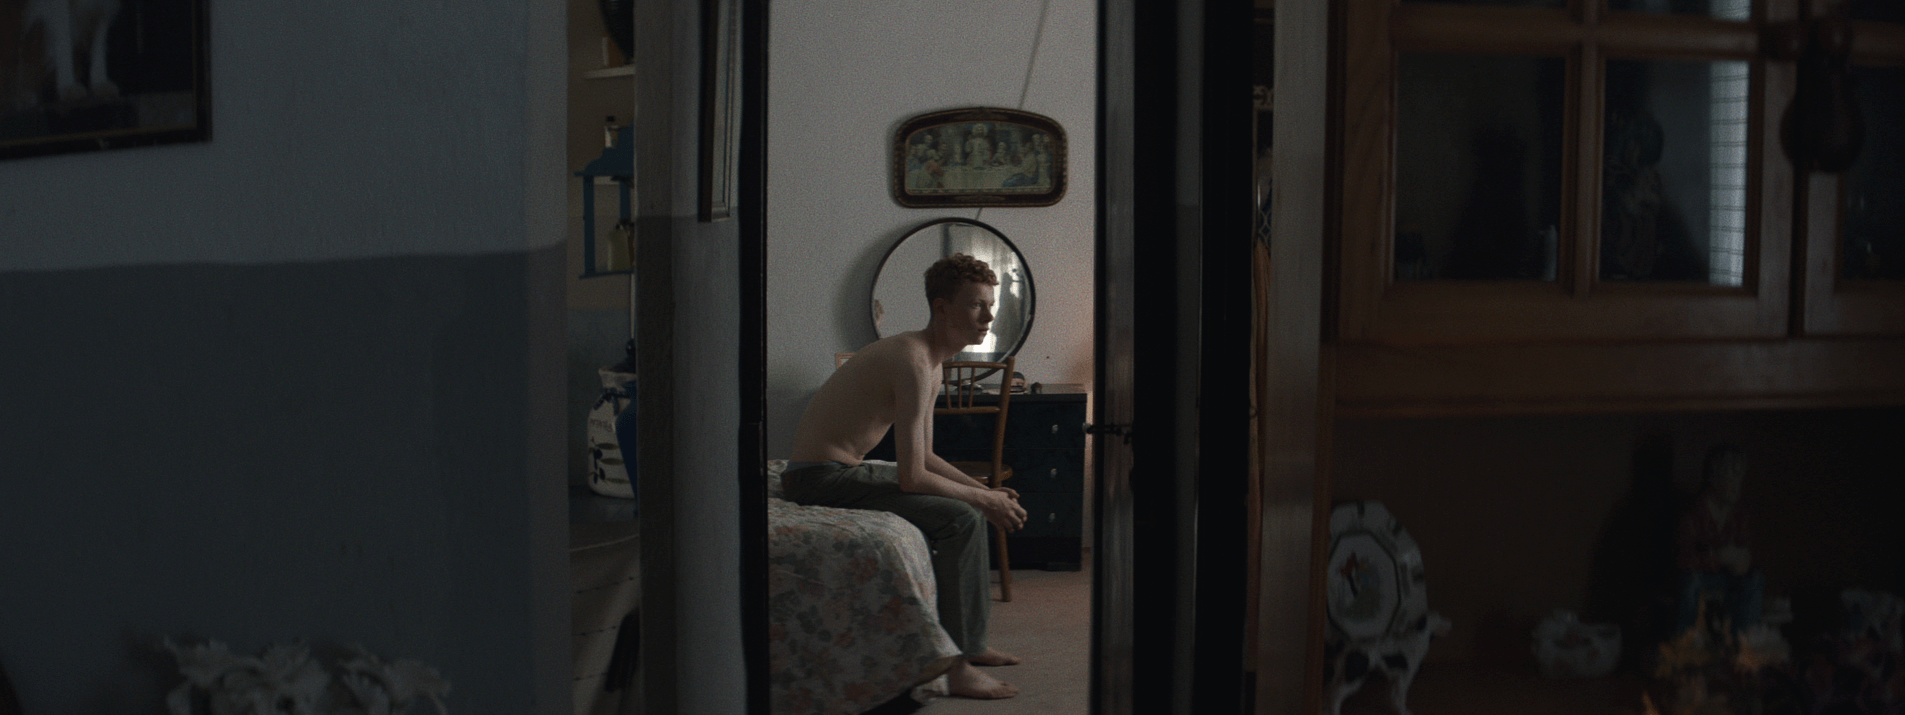 Utican – music video